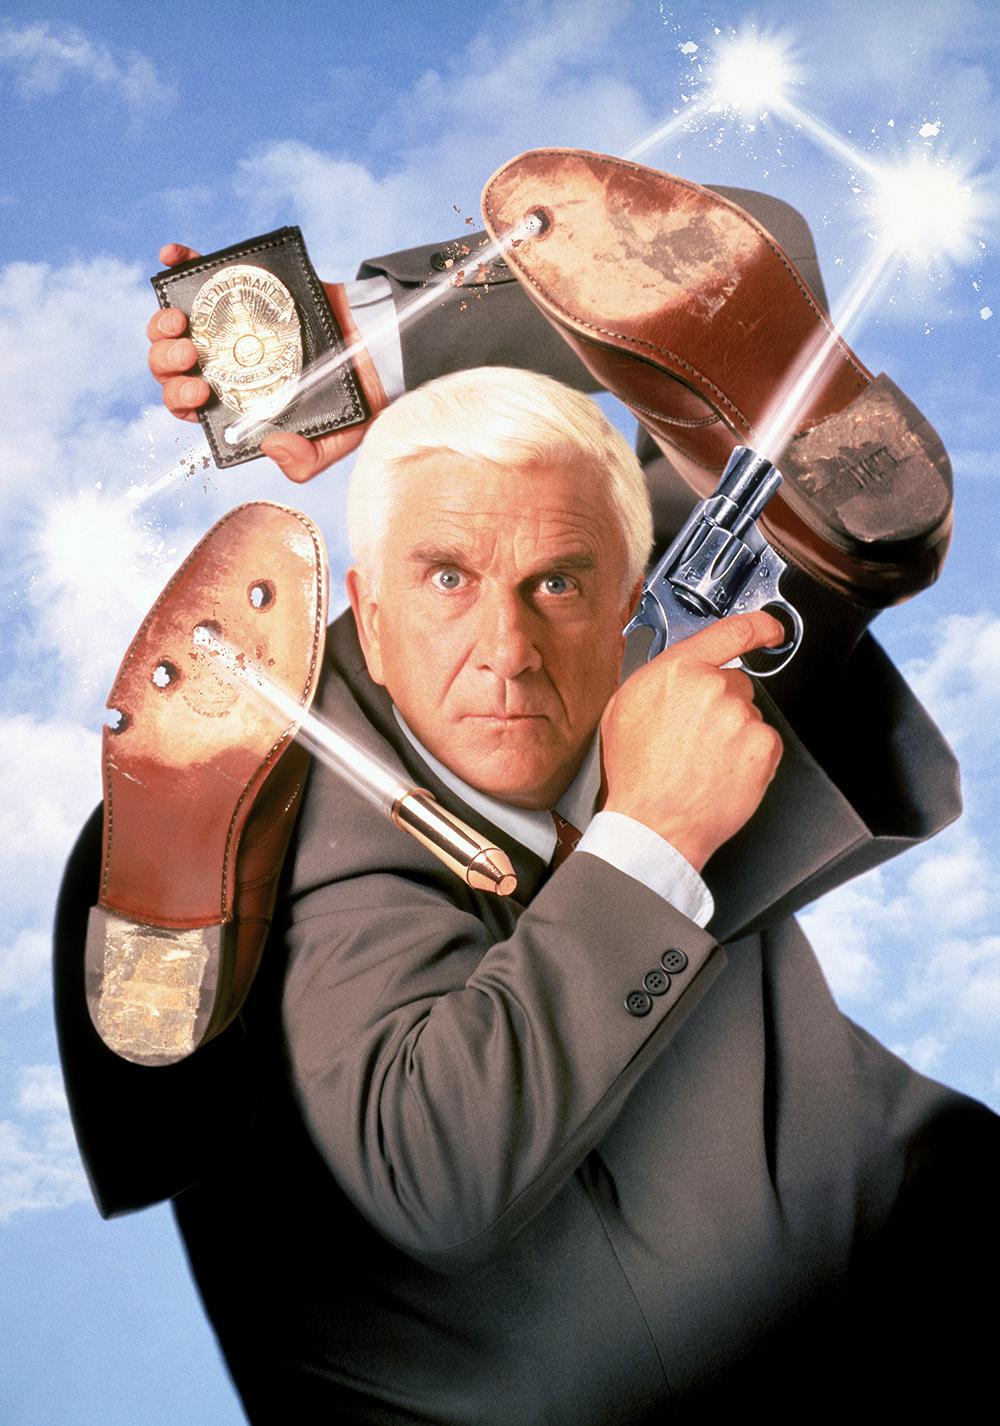 Naked Gun 33 The Final Insult  Movie Fanart  Fanarttv-7649